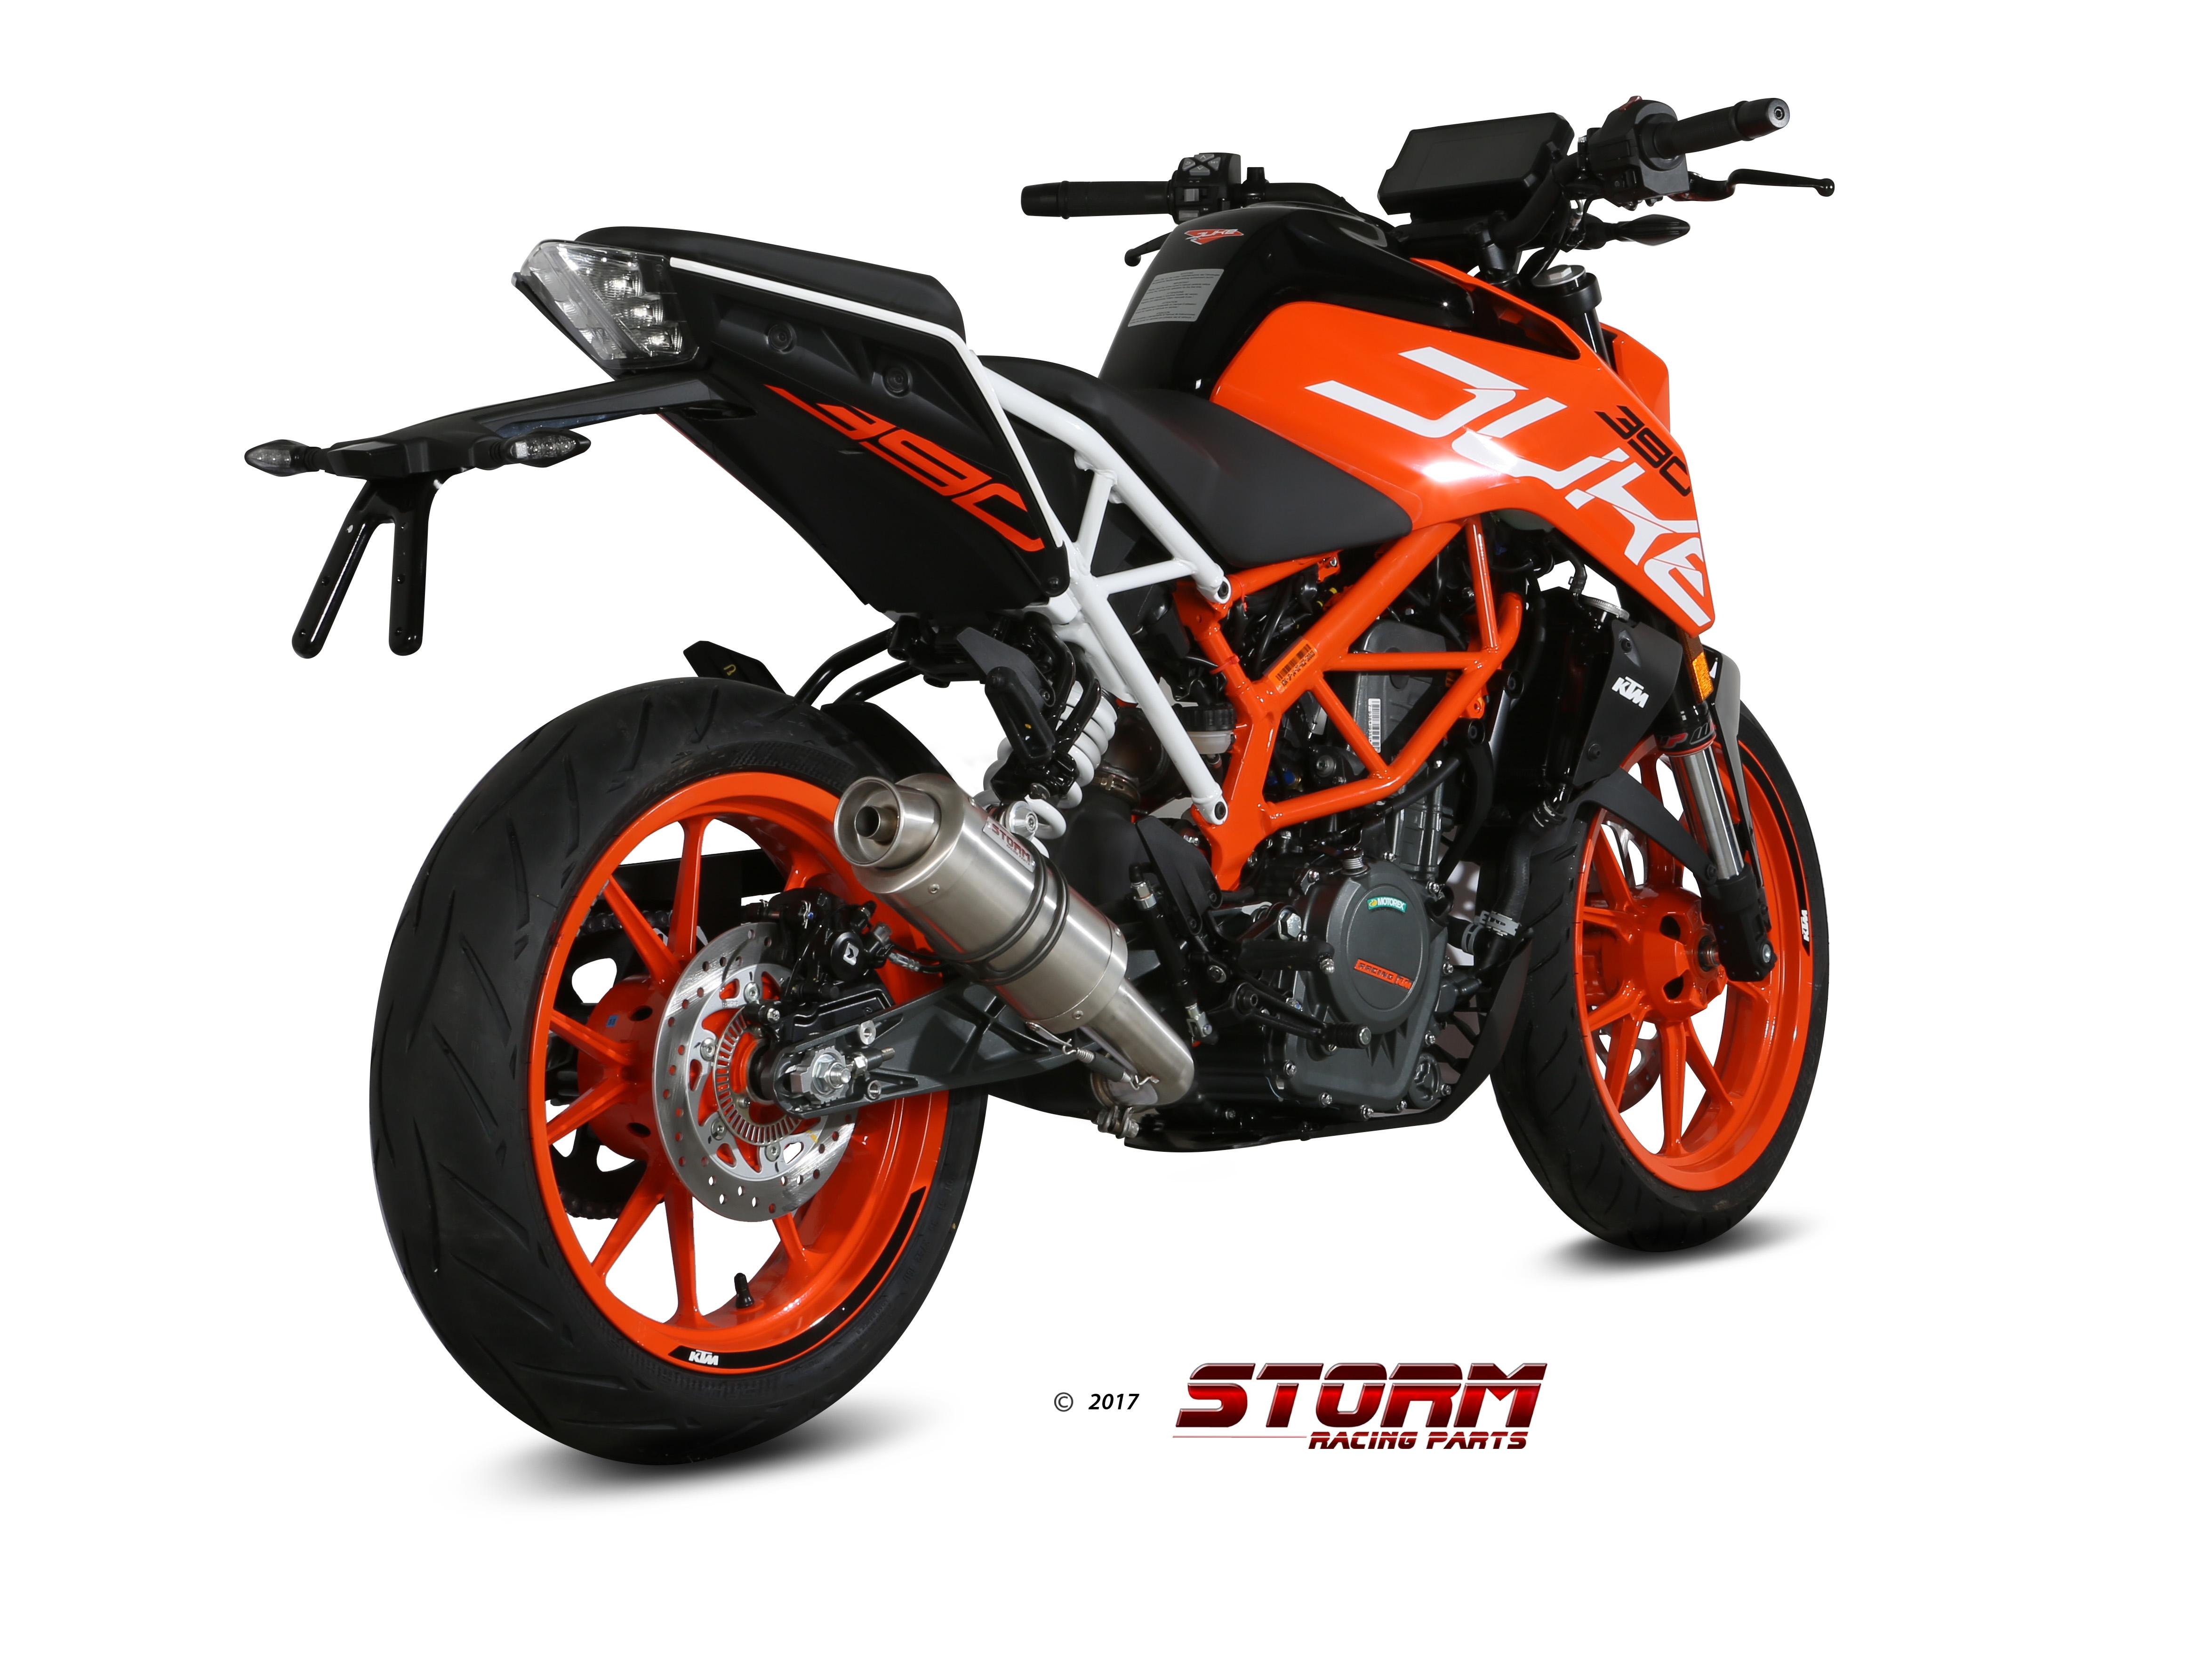 Scarico KTM 390 DUKE Storm Gp Inox 74.KT.019.LXS